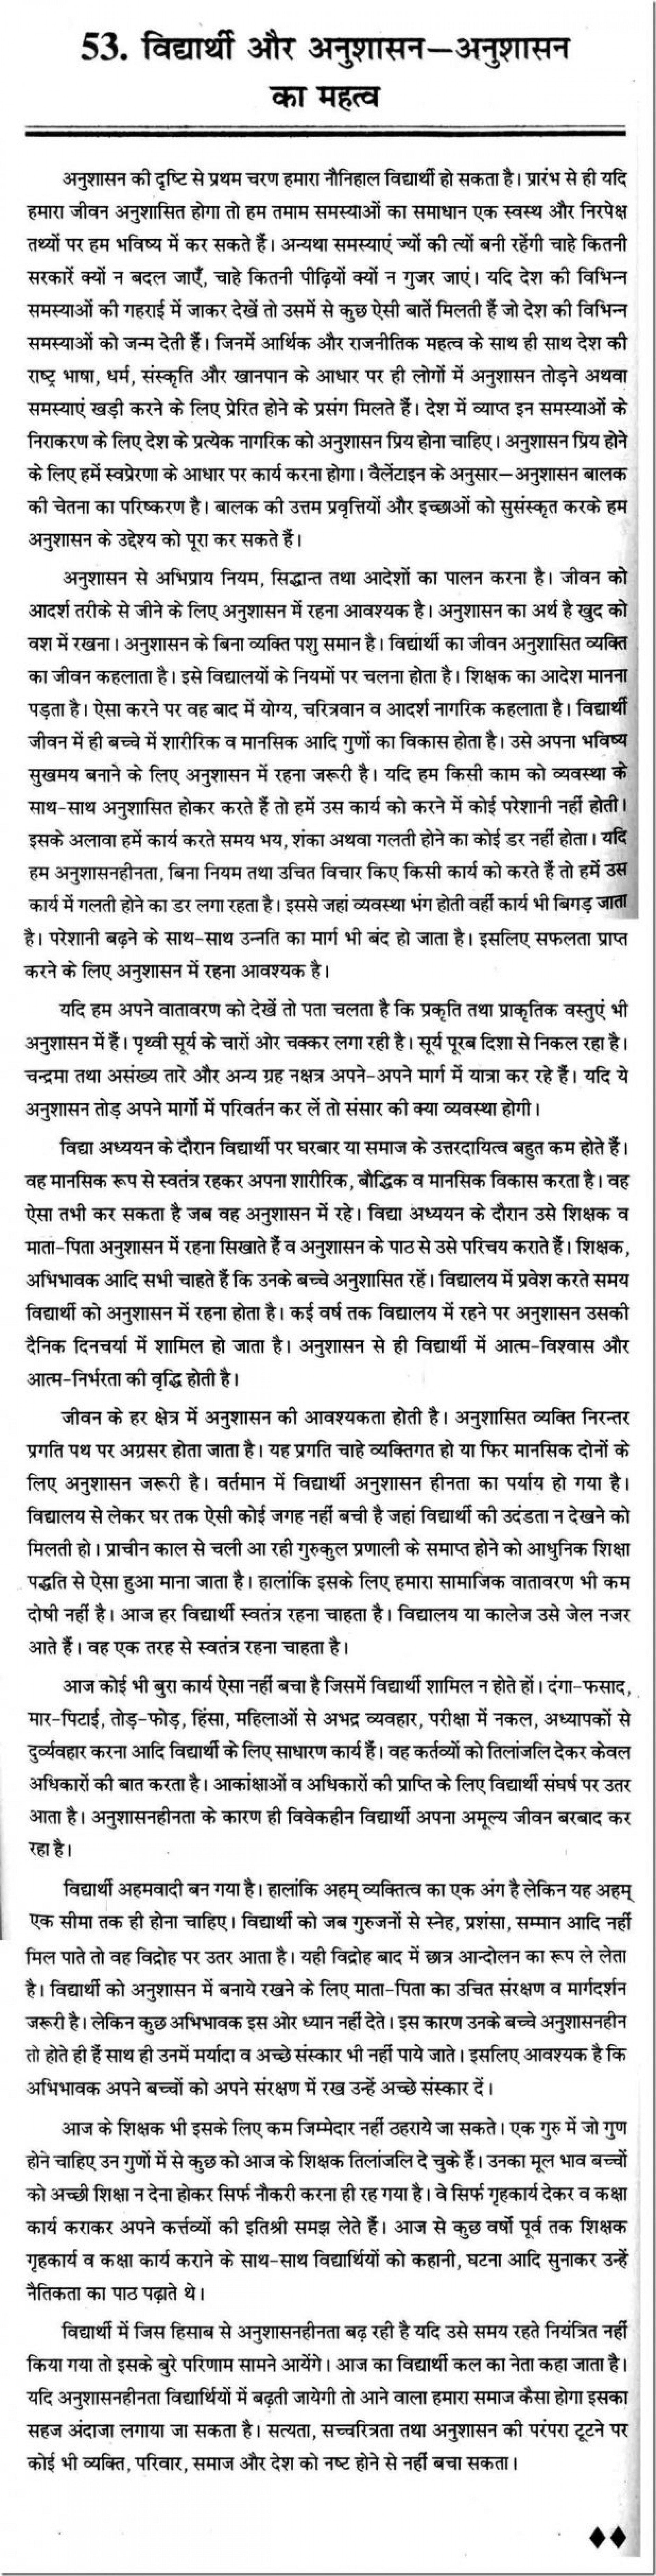 008 Studentife Essay Thumb In Nepali Punjabi Person Technology Collegeanguage Topics Hindi For Of Athlete Sanskrit Kannada Pdf English Class 618x2426 Example Importance Best College Life On Discipline 1920